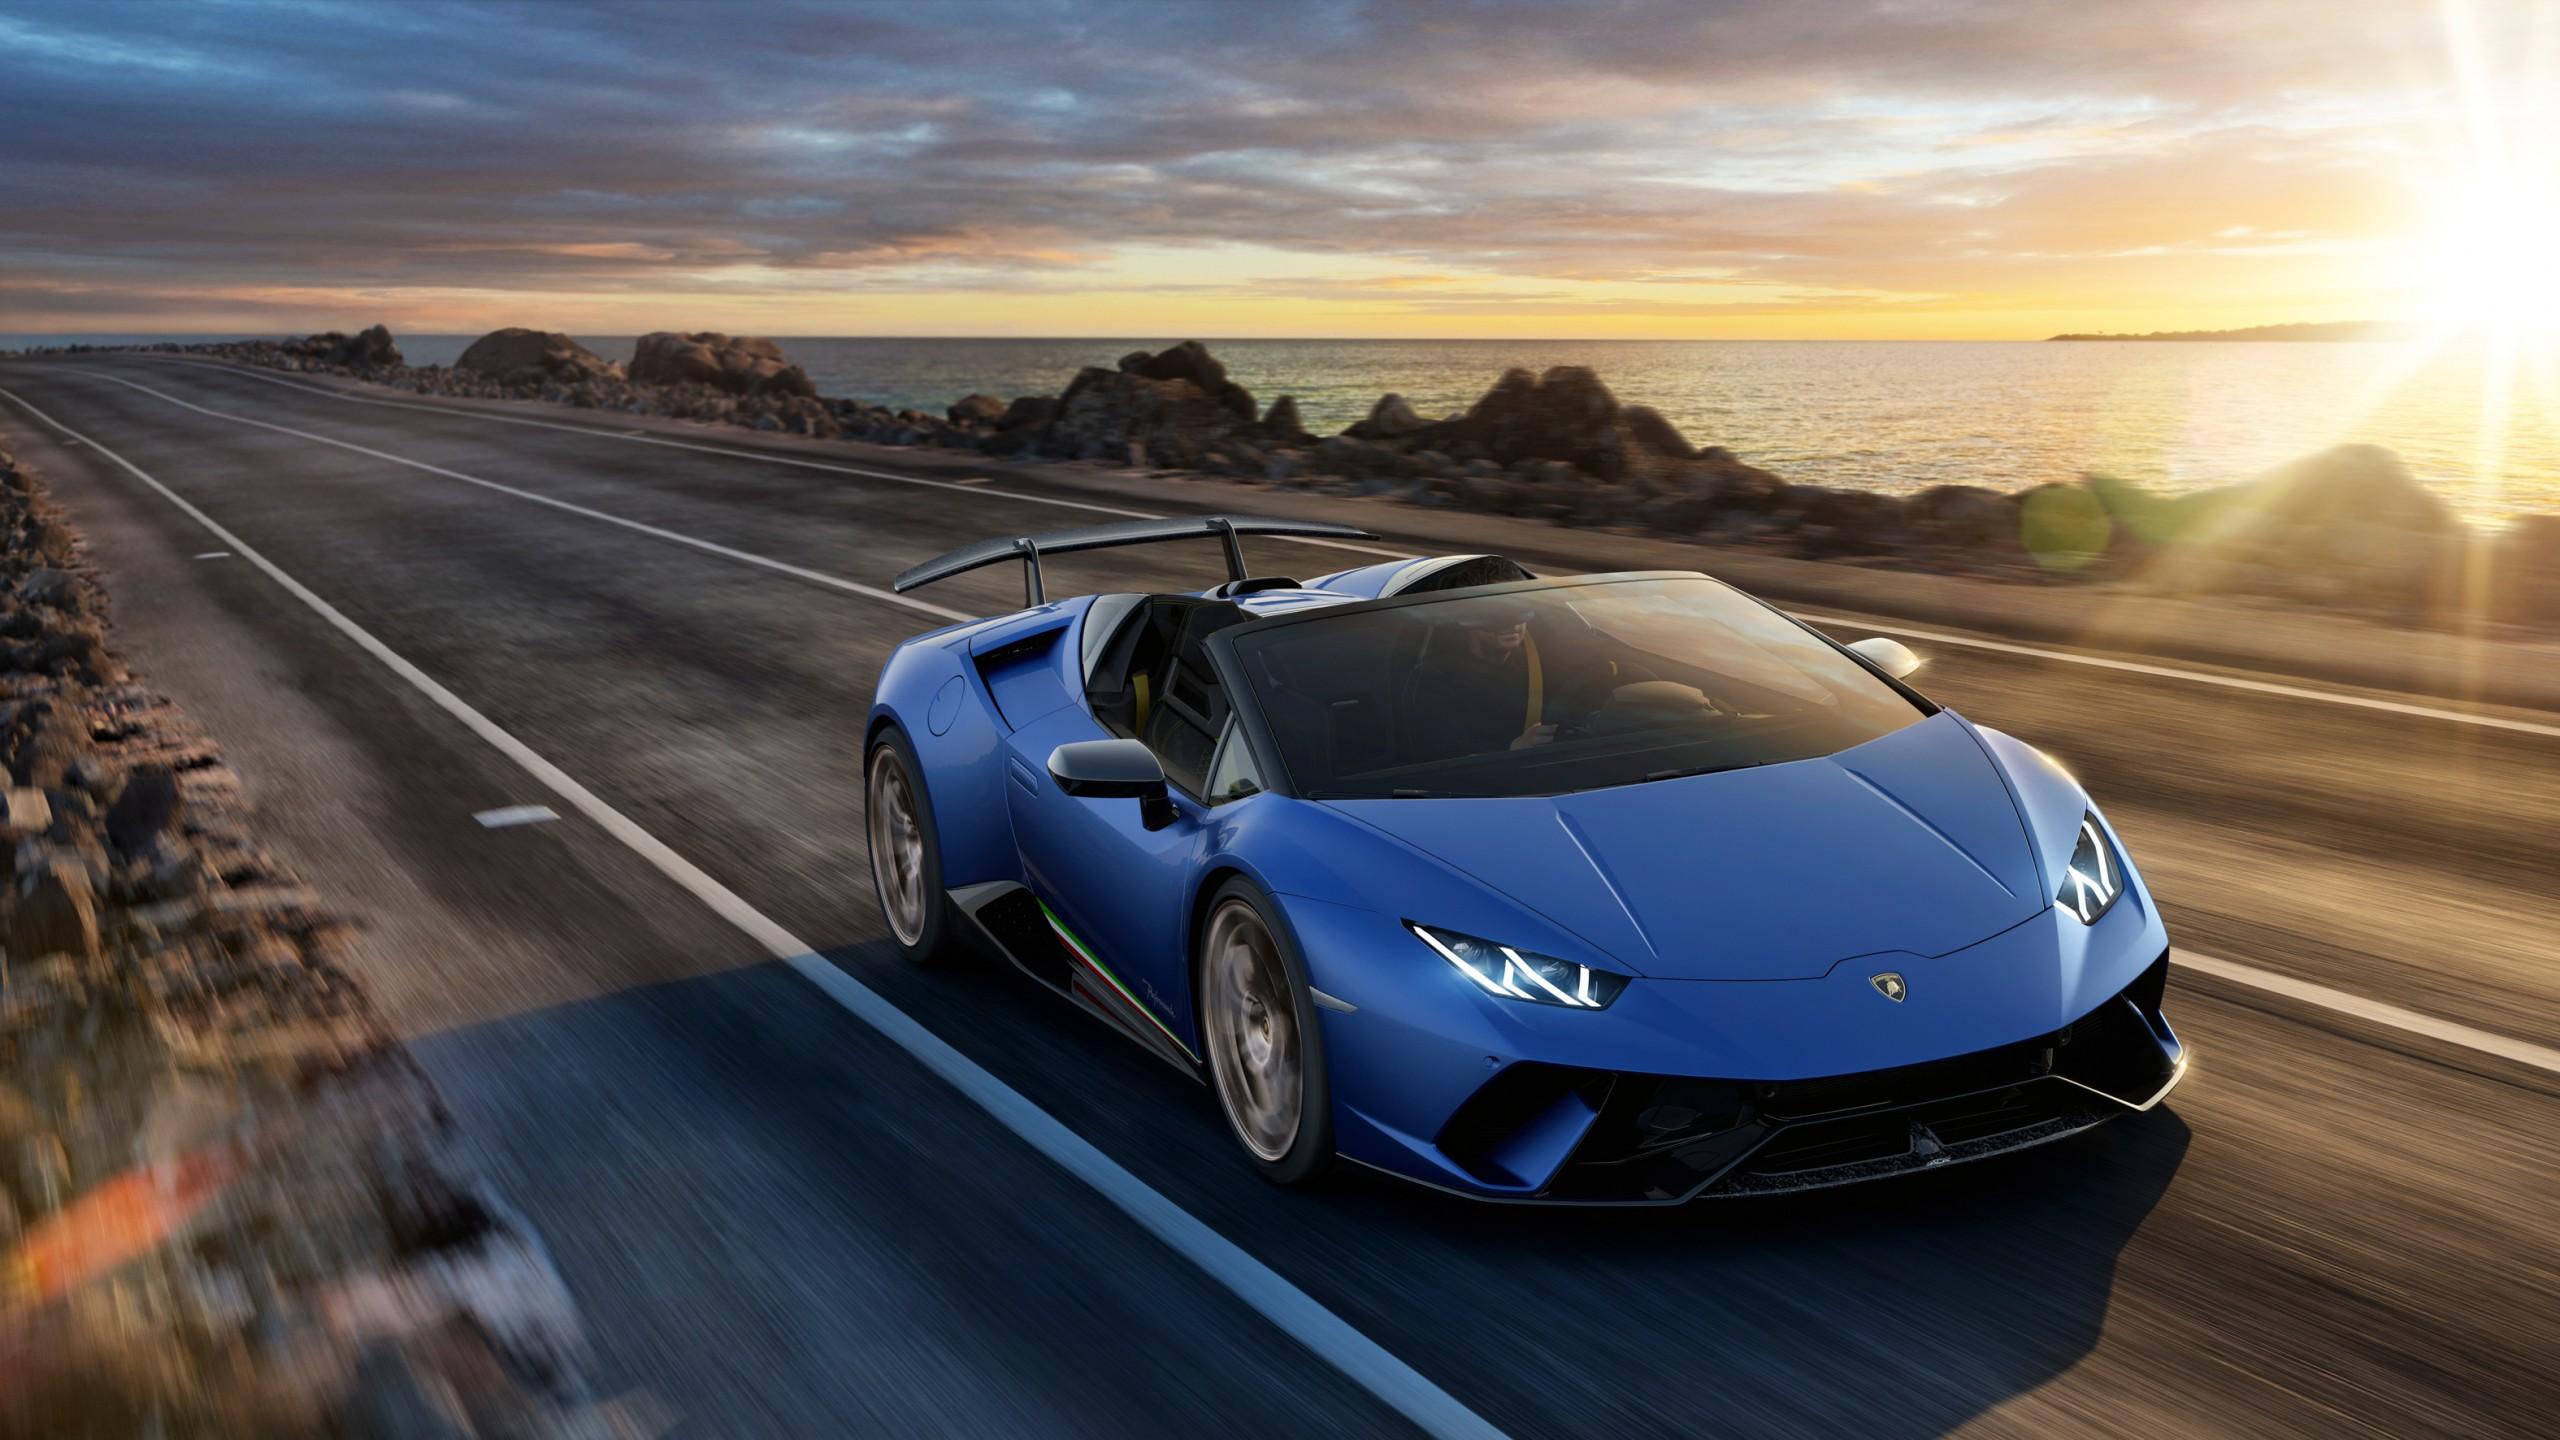 2018 Lamborghini Huracan Perfomante Spyder 2 Wallpaper ...